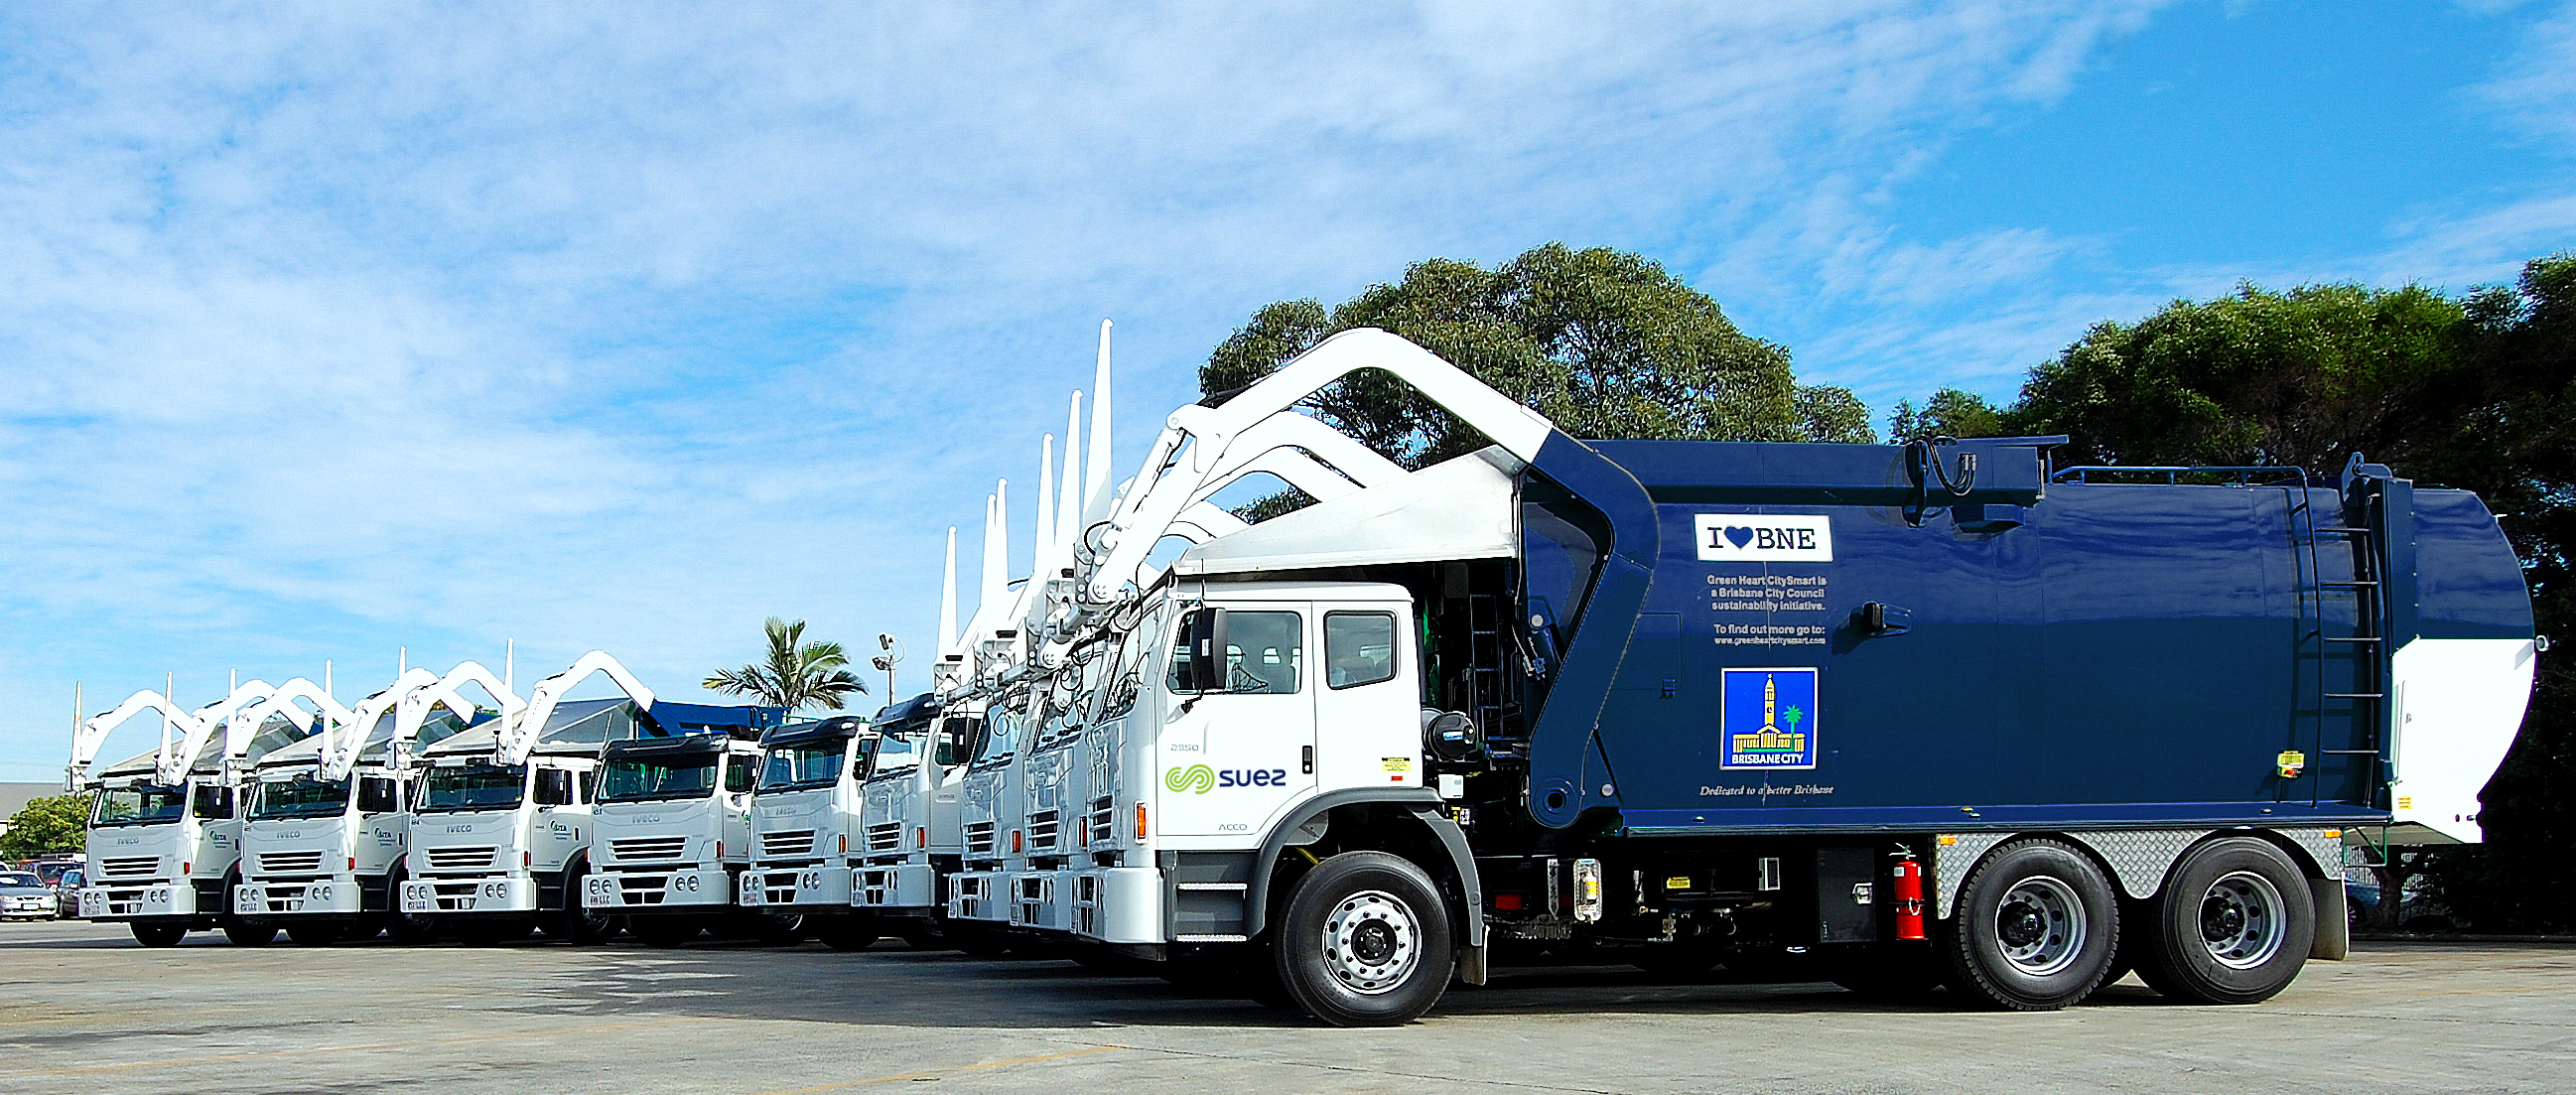 SUEZ-Brisbane council trucks